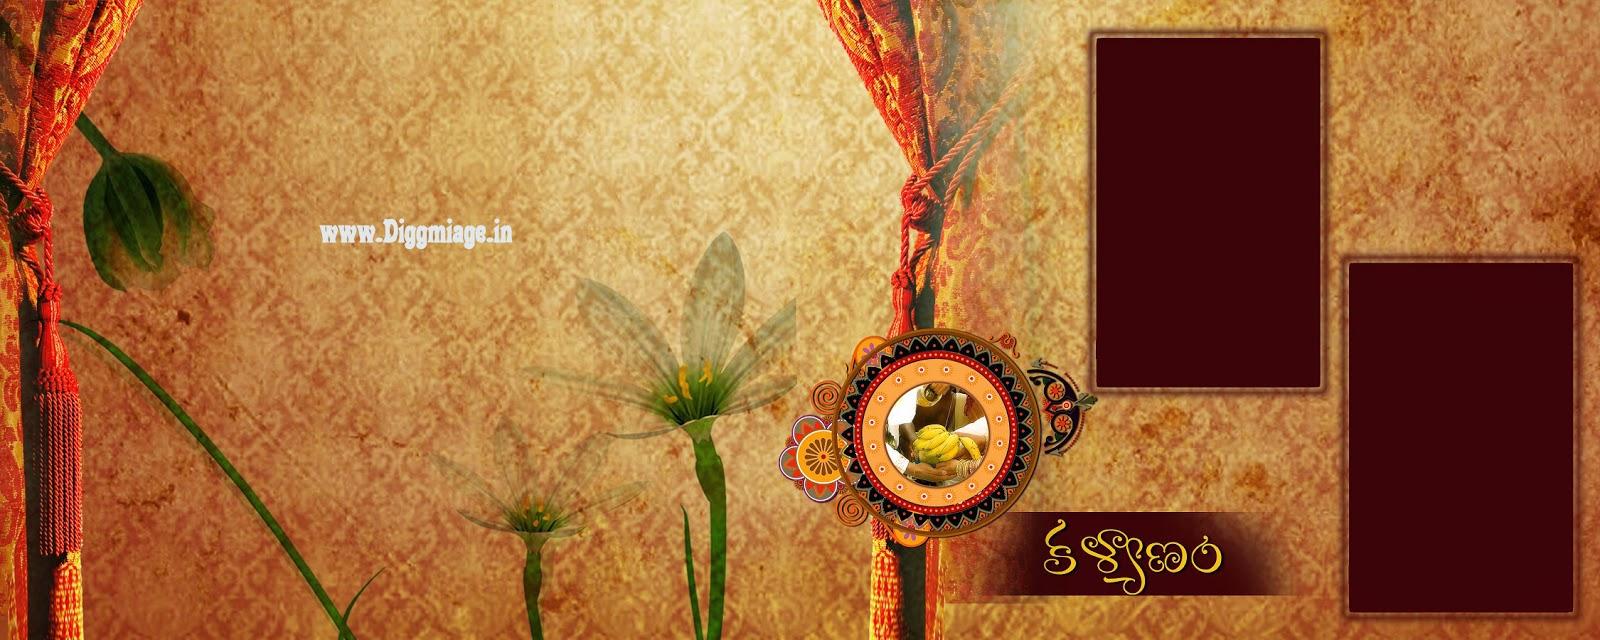 1600 x 640 jpeg 223kB, Hindus Karizma album (size 12x30 inc ) sheets ...